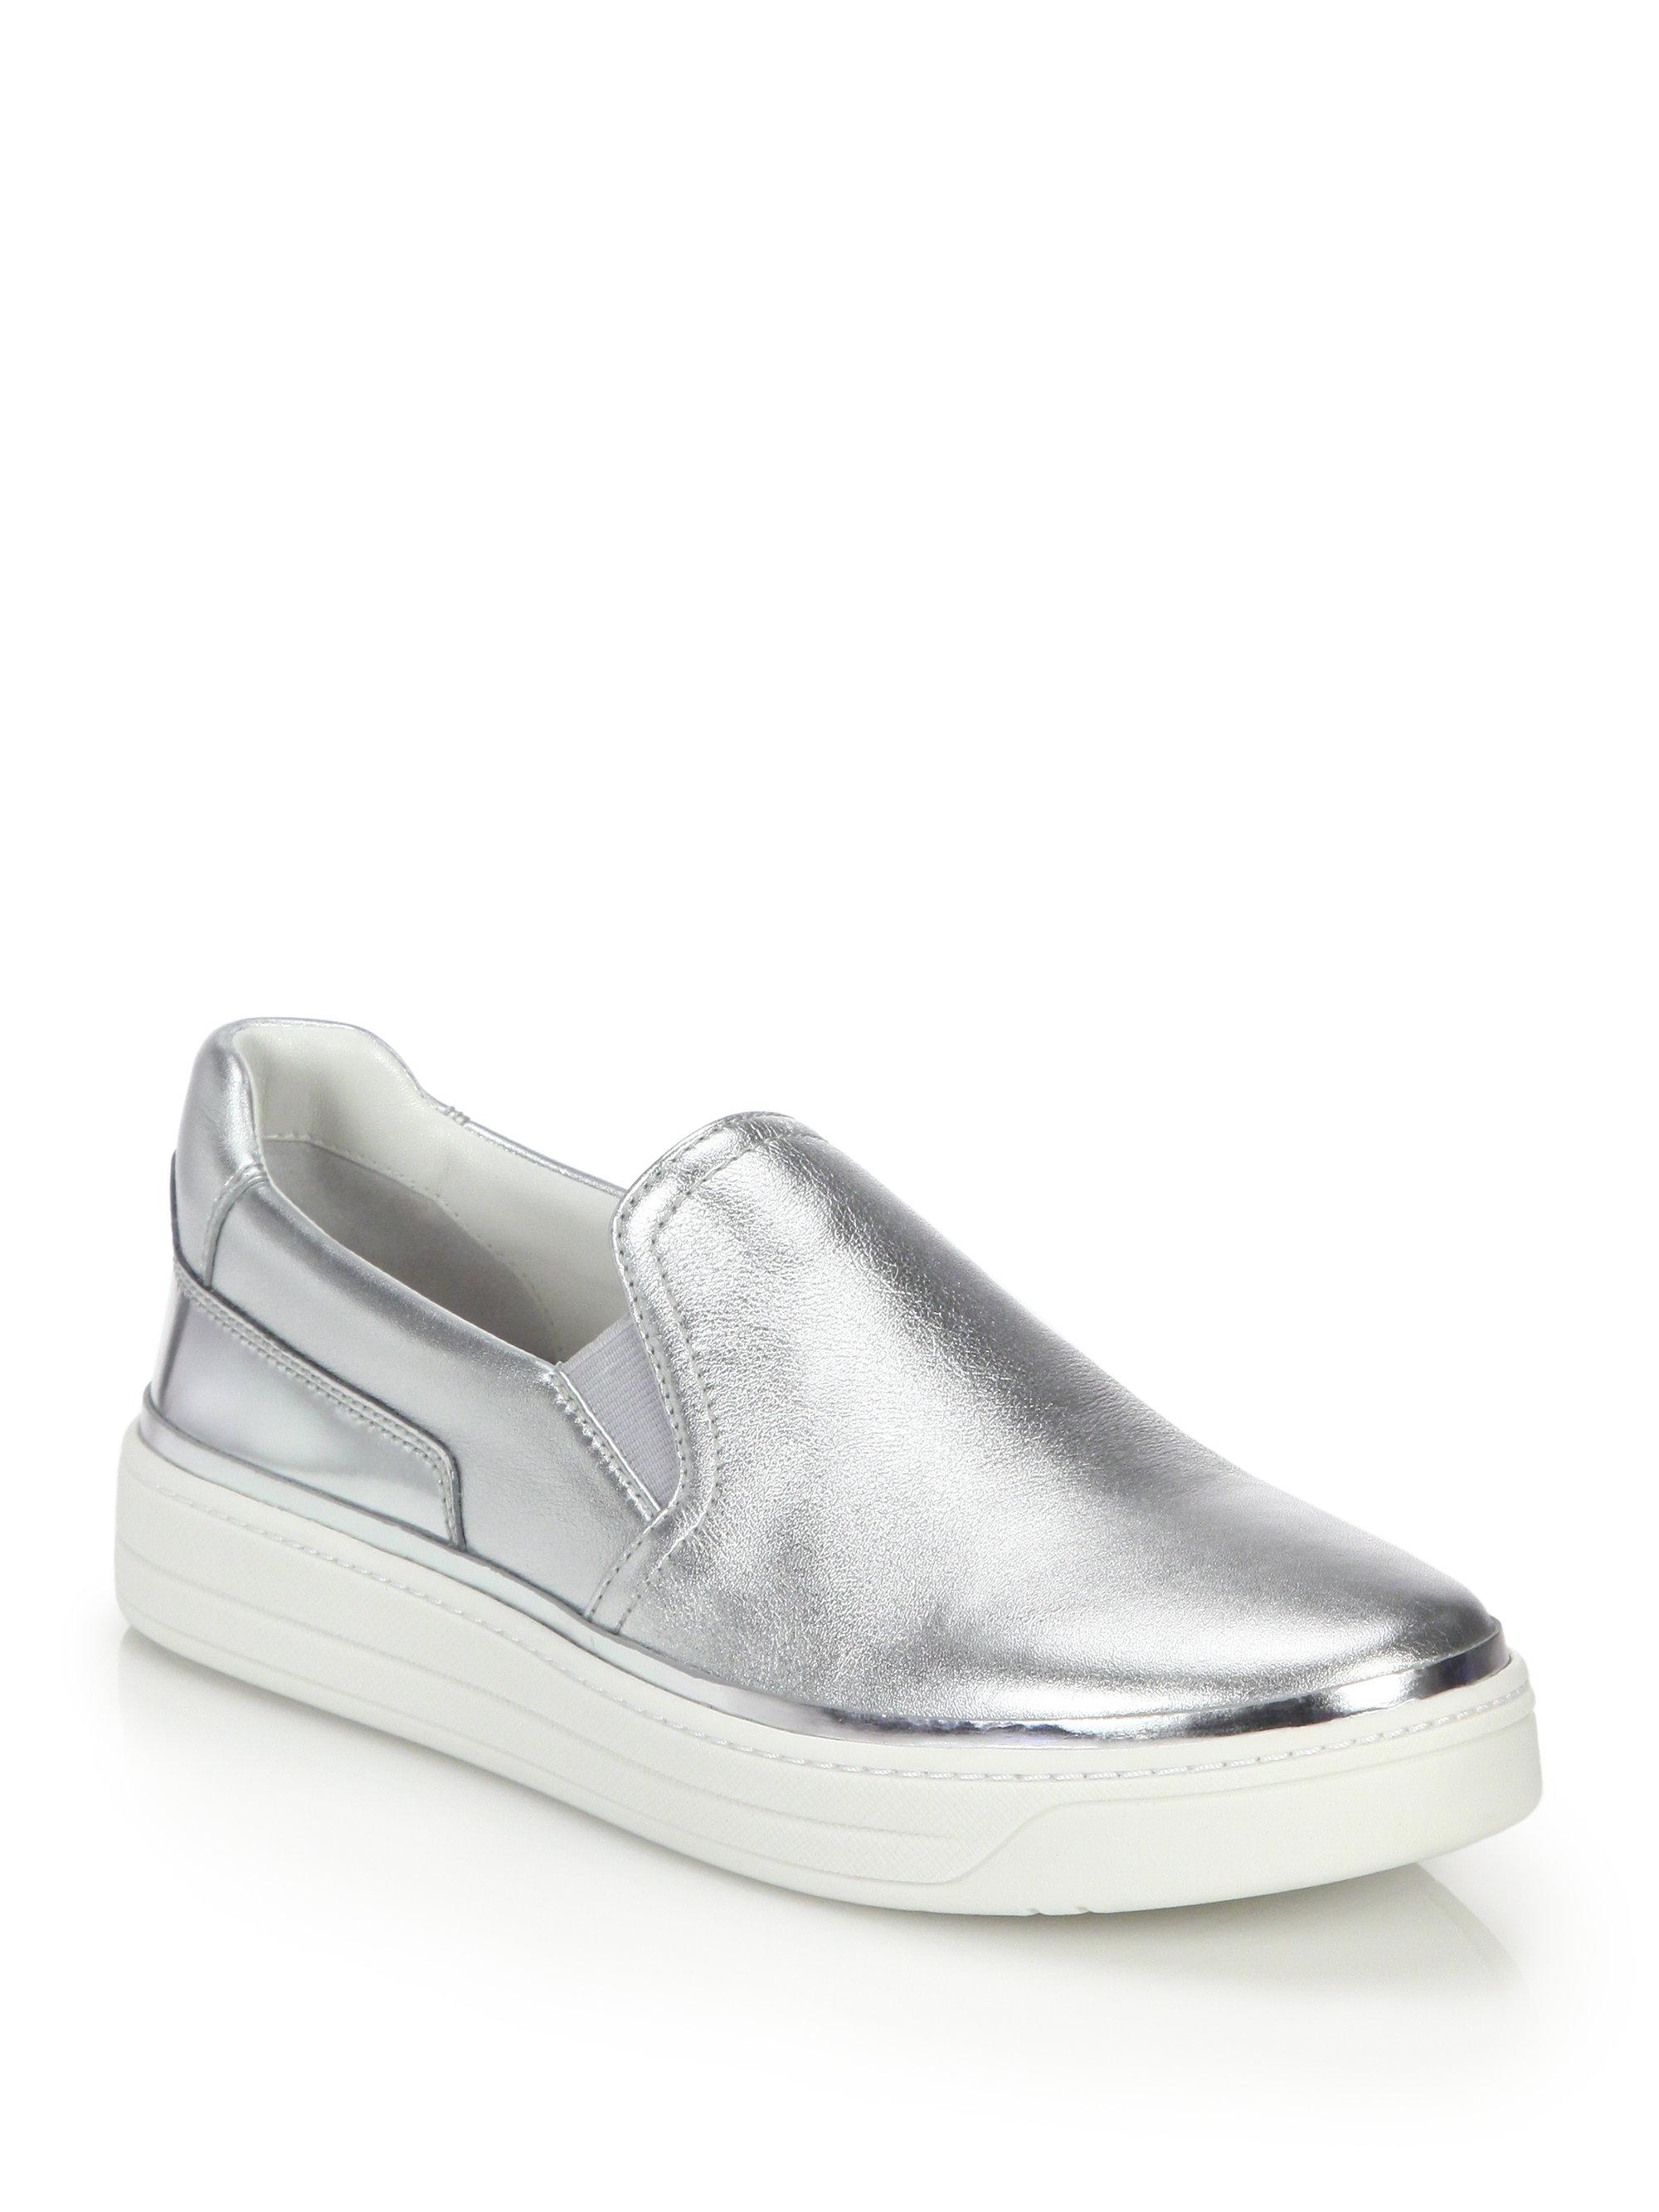 Prada Sport Metallic Slip-On Sneakers lowest price online footlocker sale online cheap sale best fashion Style for sale eMAco